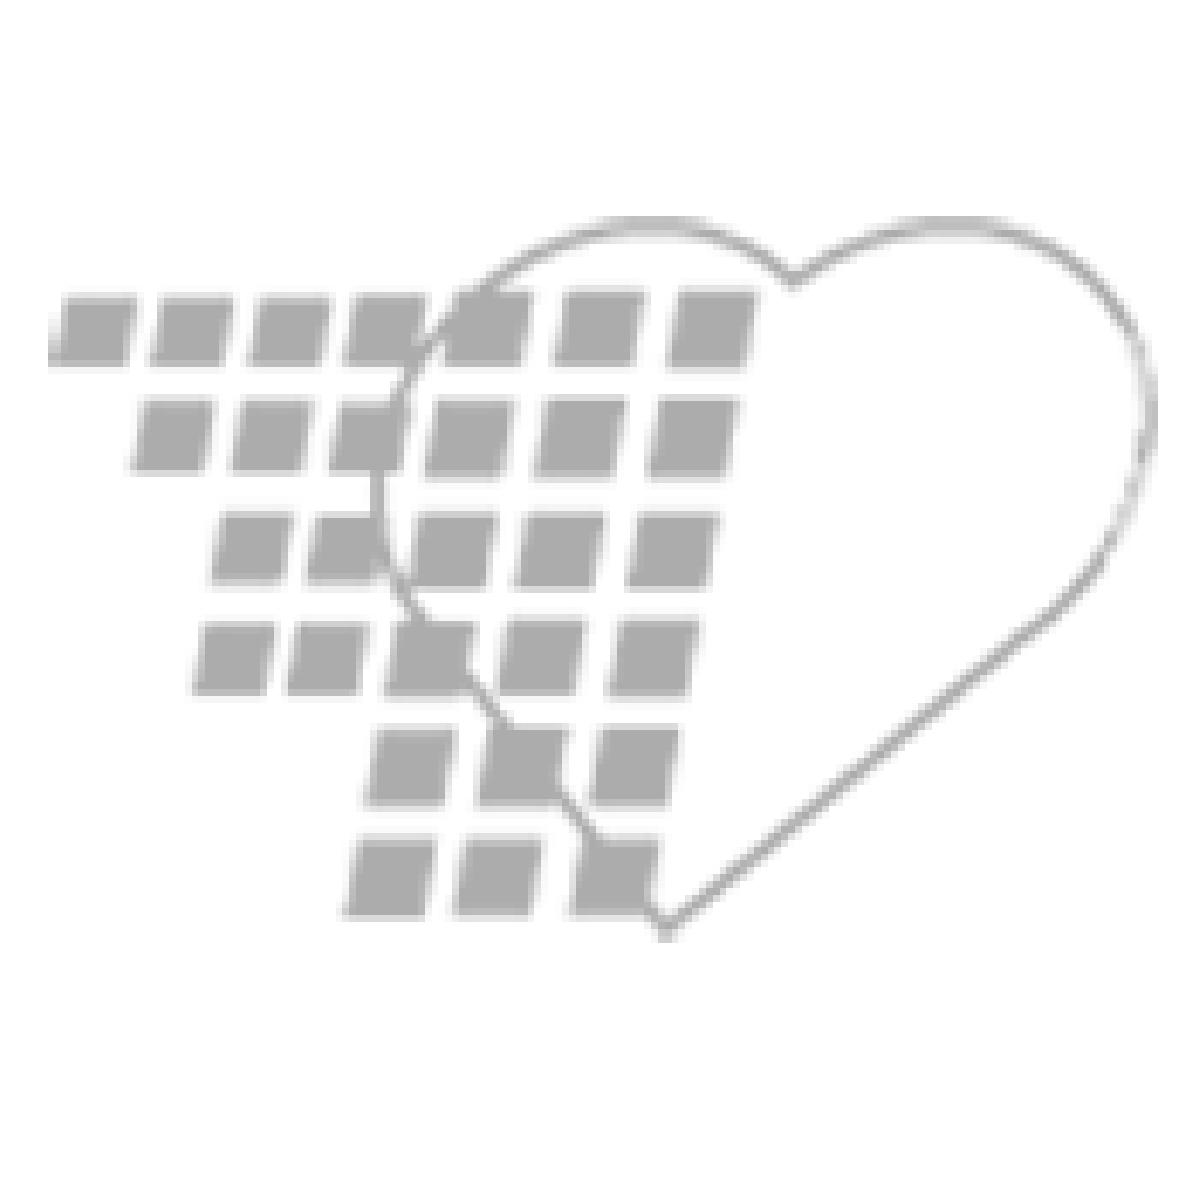 06-54-0220 - Statlock® Picc Plus Stabilization Device